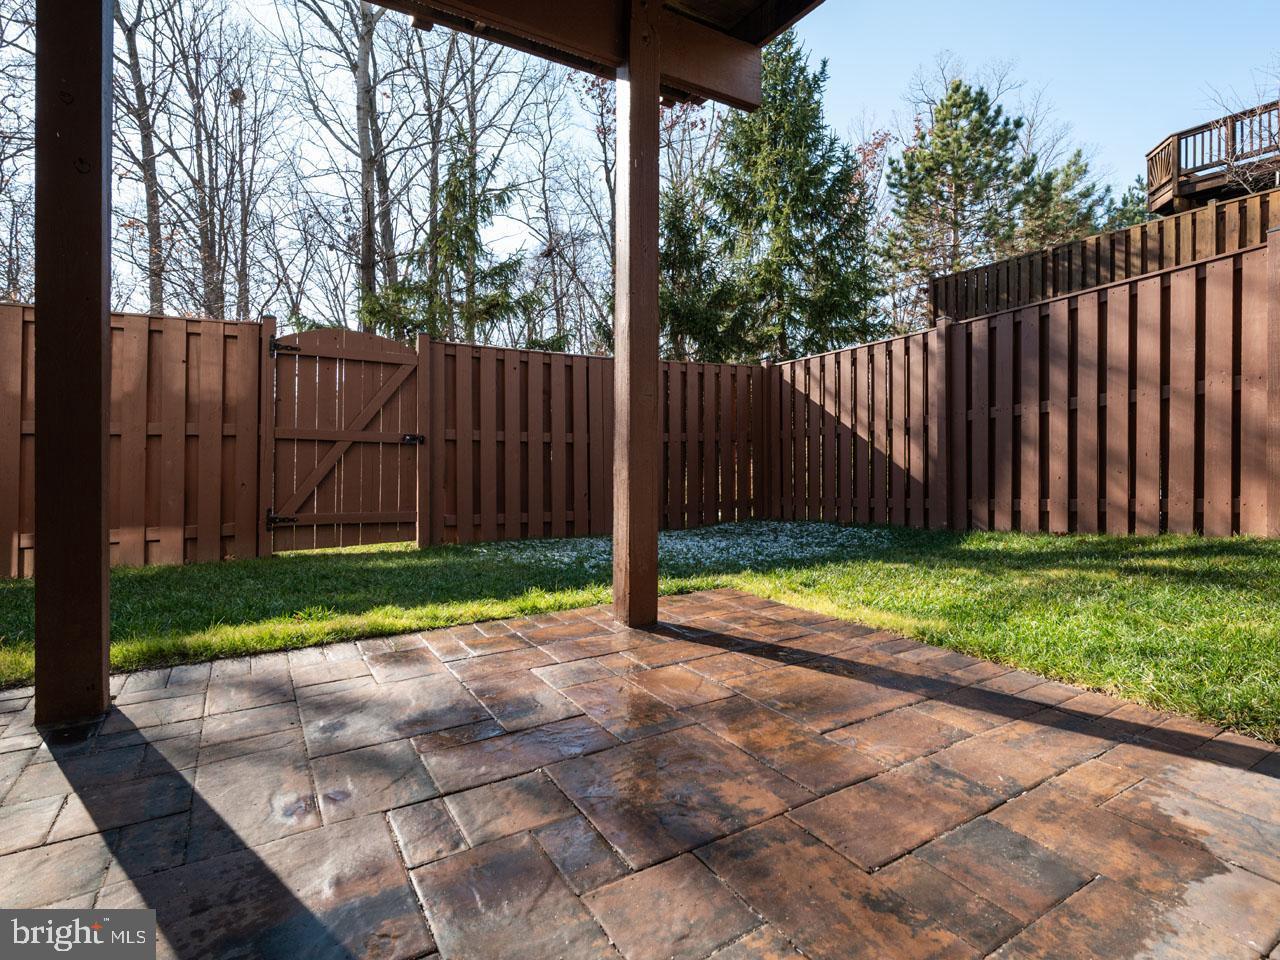 VAFX1104336-302201657759-2021-07-16-19-45-23  |   | Alexandria Delaware Real Estate For Sale | MLS# Vafx1104336  - Best of Northern Virginia